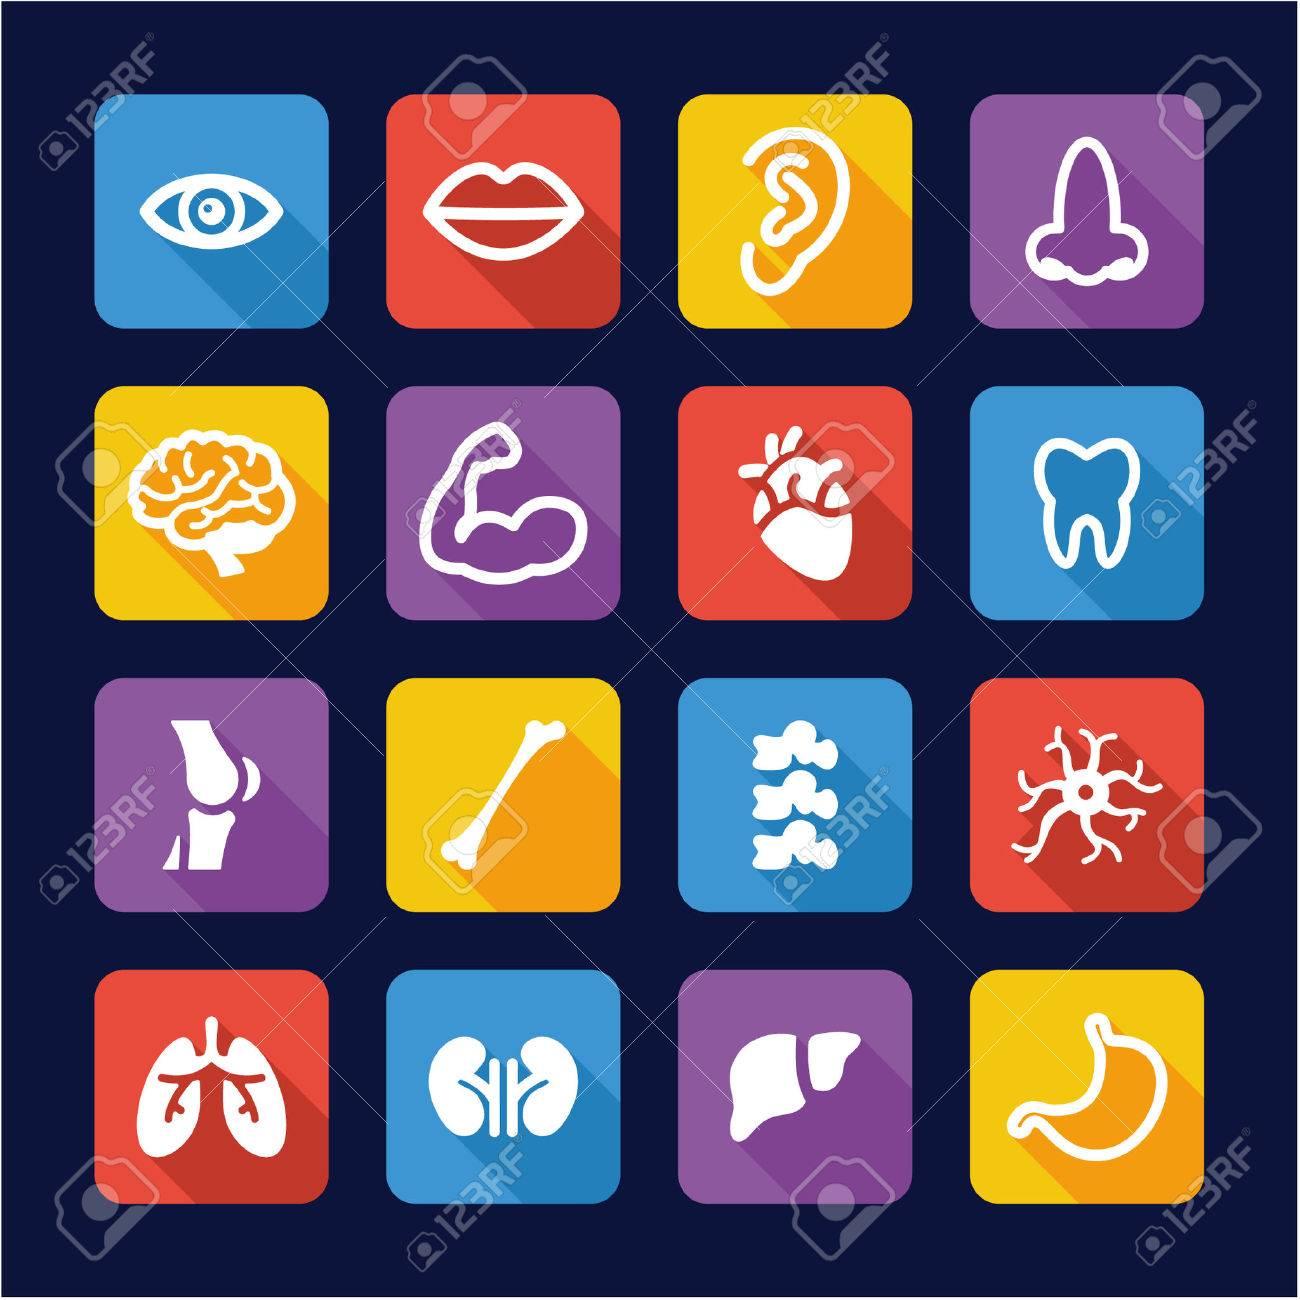 Human Anatomy Icons Flat Design - 47612795